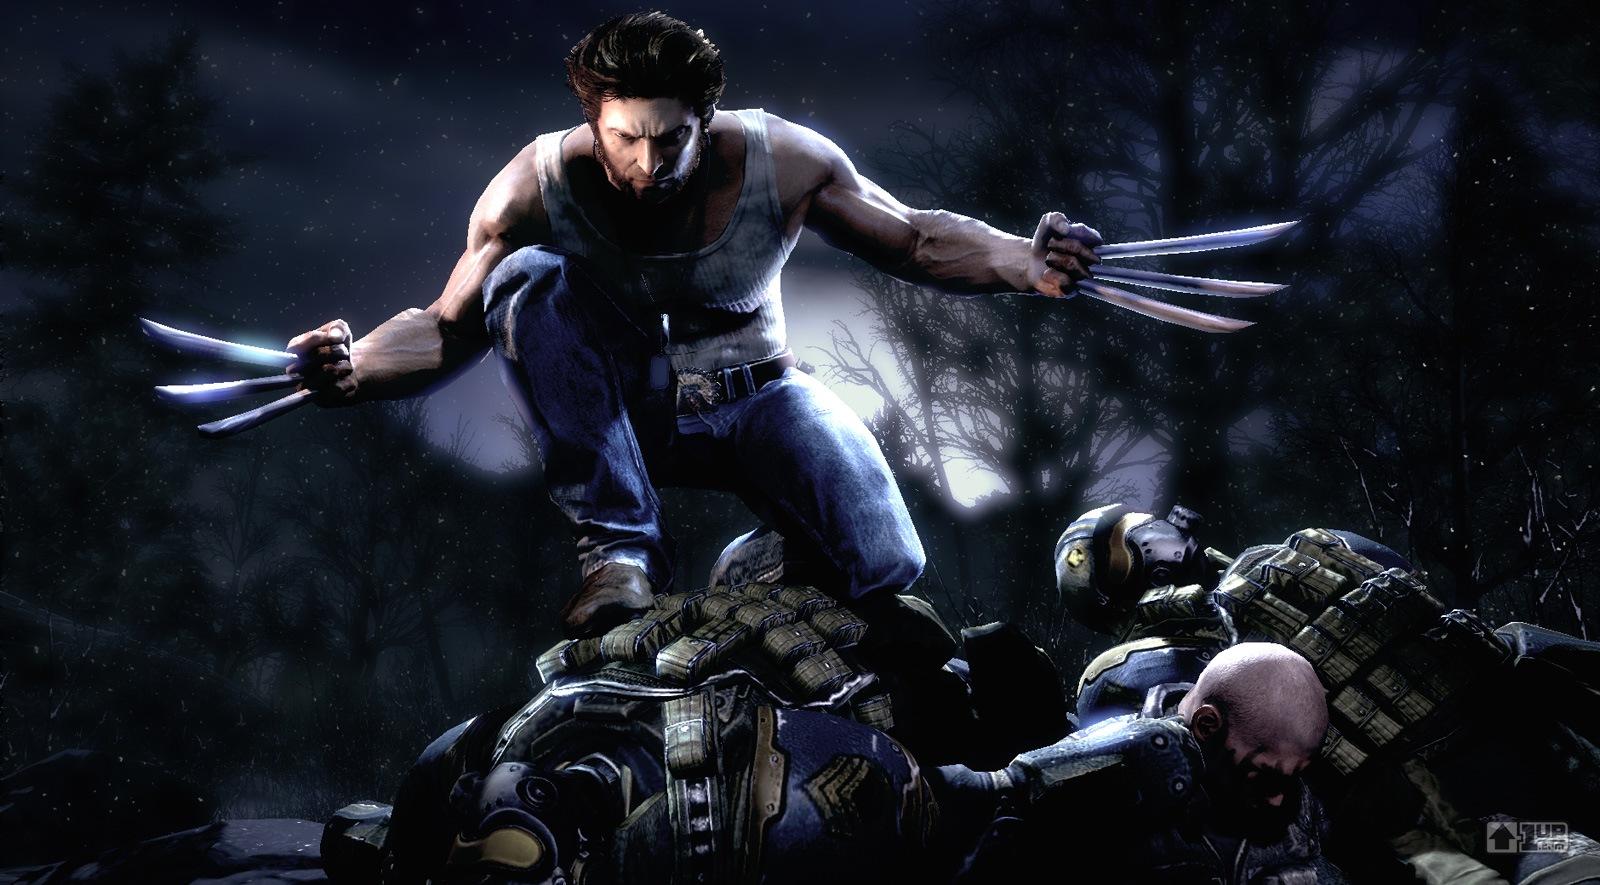 Imagenes De Xmen: Dream Games: X-Men Origins